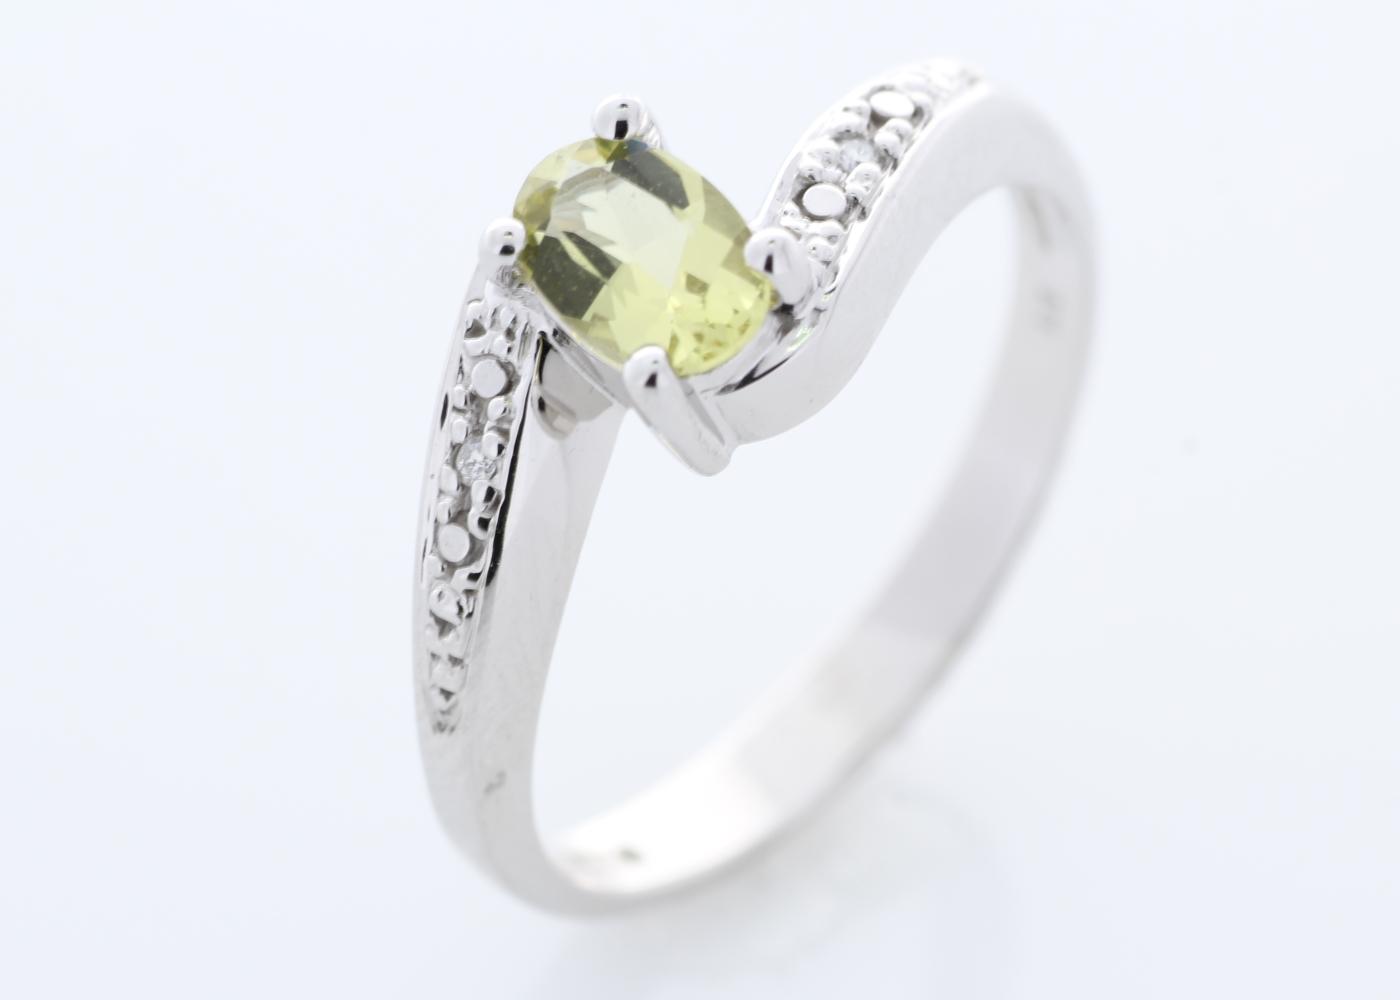 9ct White Gold Diamond And Lemon Quartz Ring - Image 7 of 8